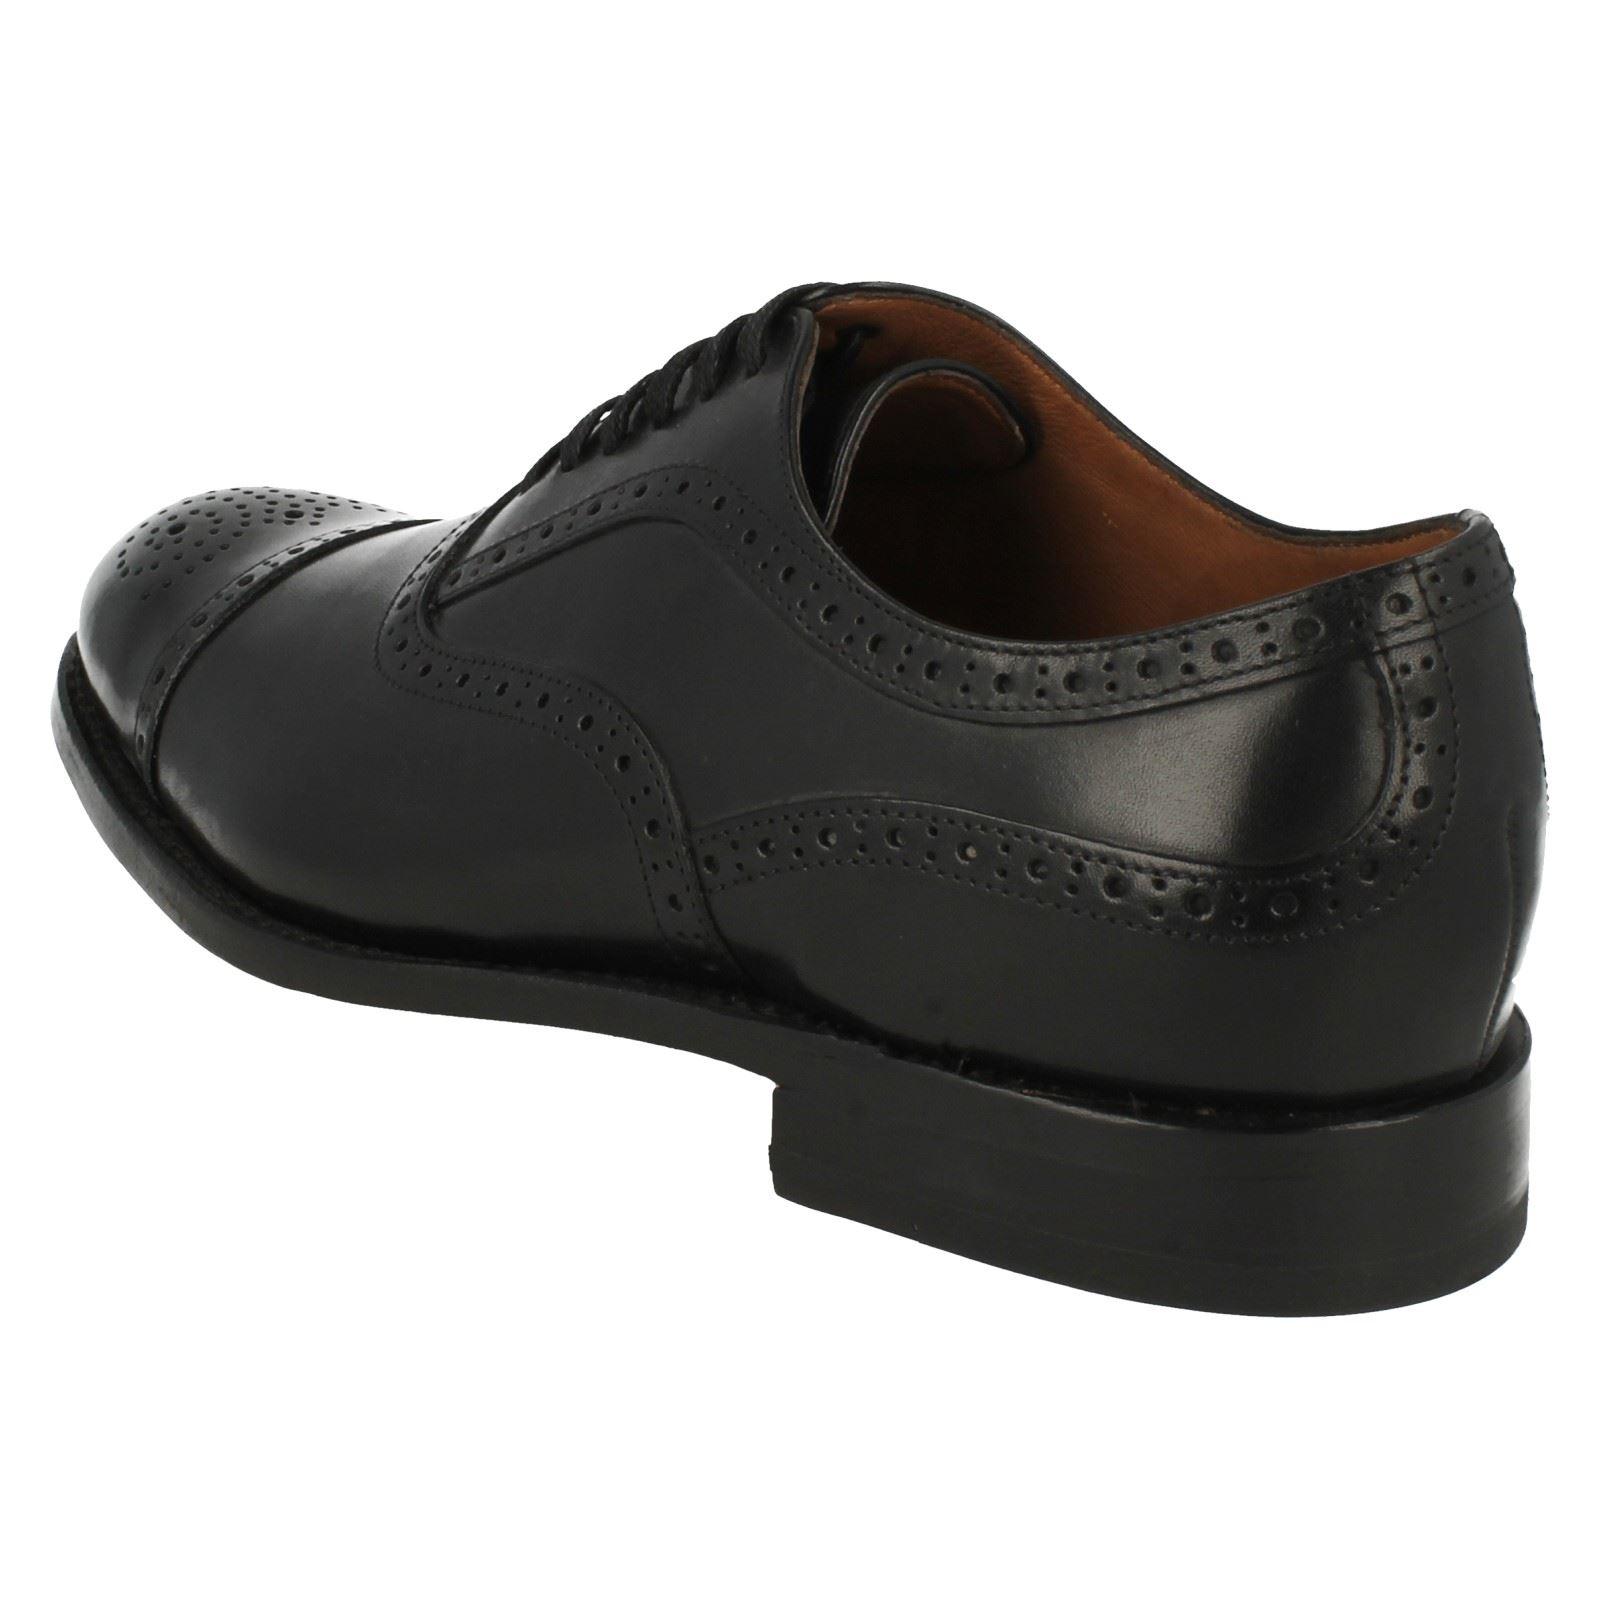 Mens Clarks Formal Schuhes schwarzcheck Cap